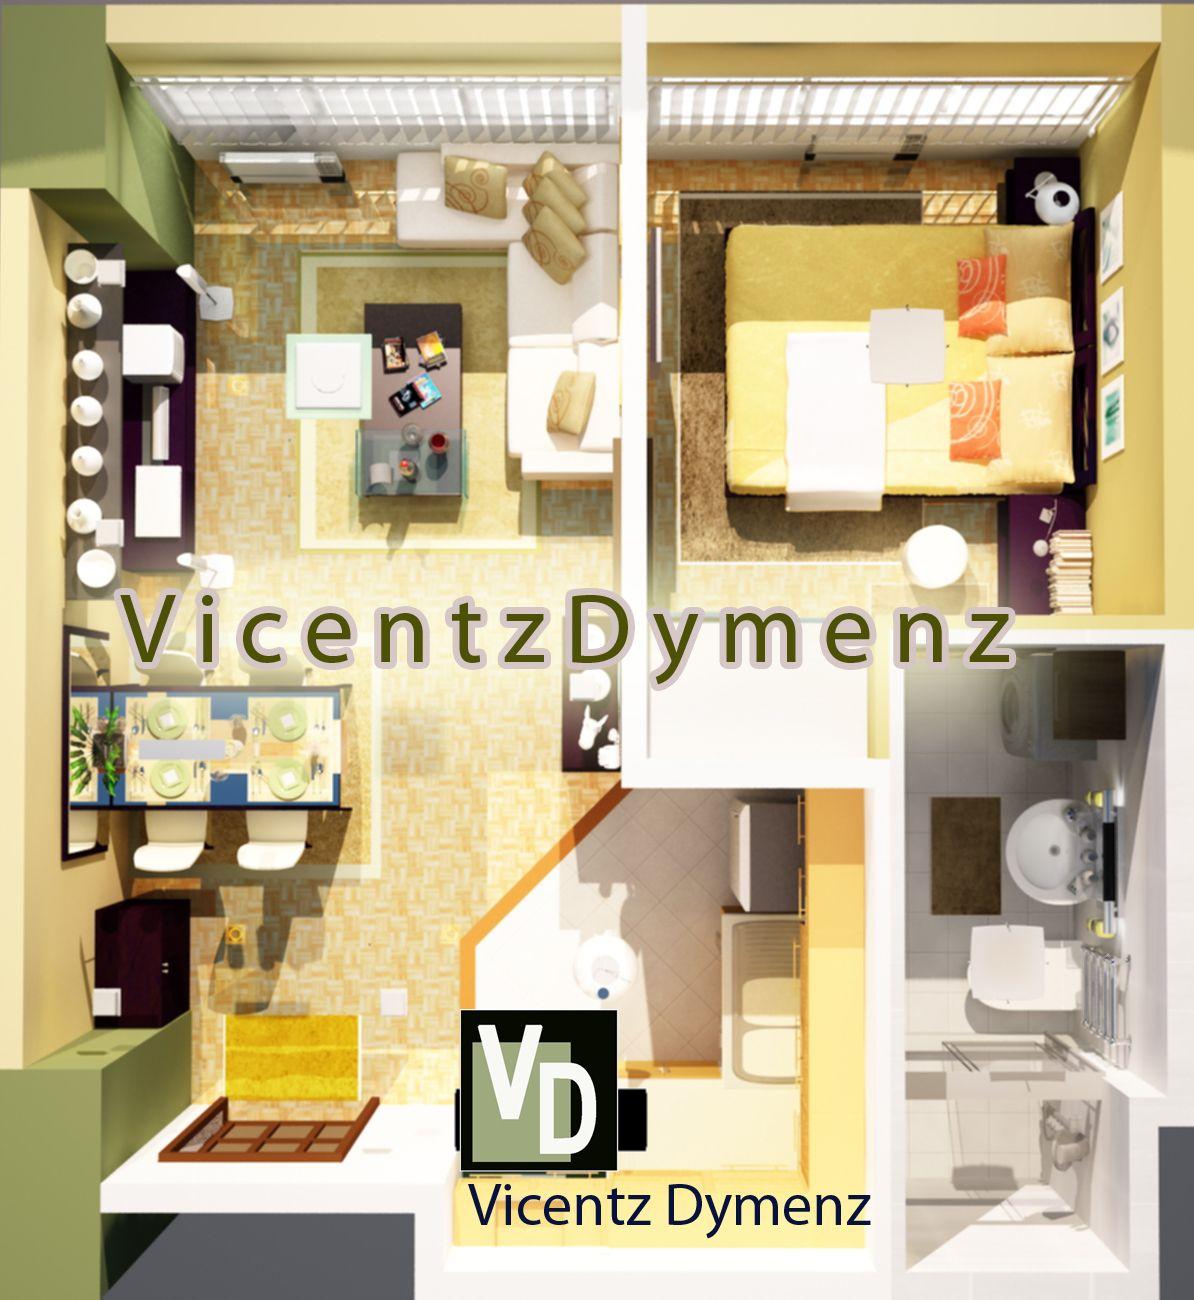 Pin By Mikesumido On 3d Interior Design 1 For A 1 Bedroom Studio Type Condo Unit 3d Interior Design Studio Type Condo Interior Design